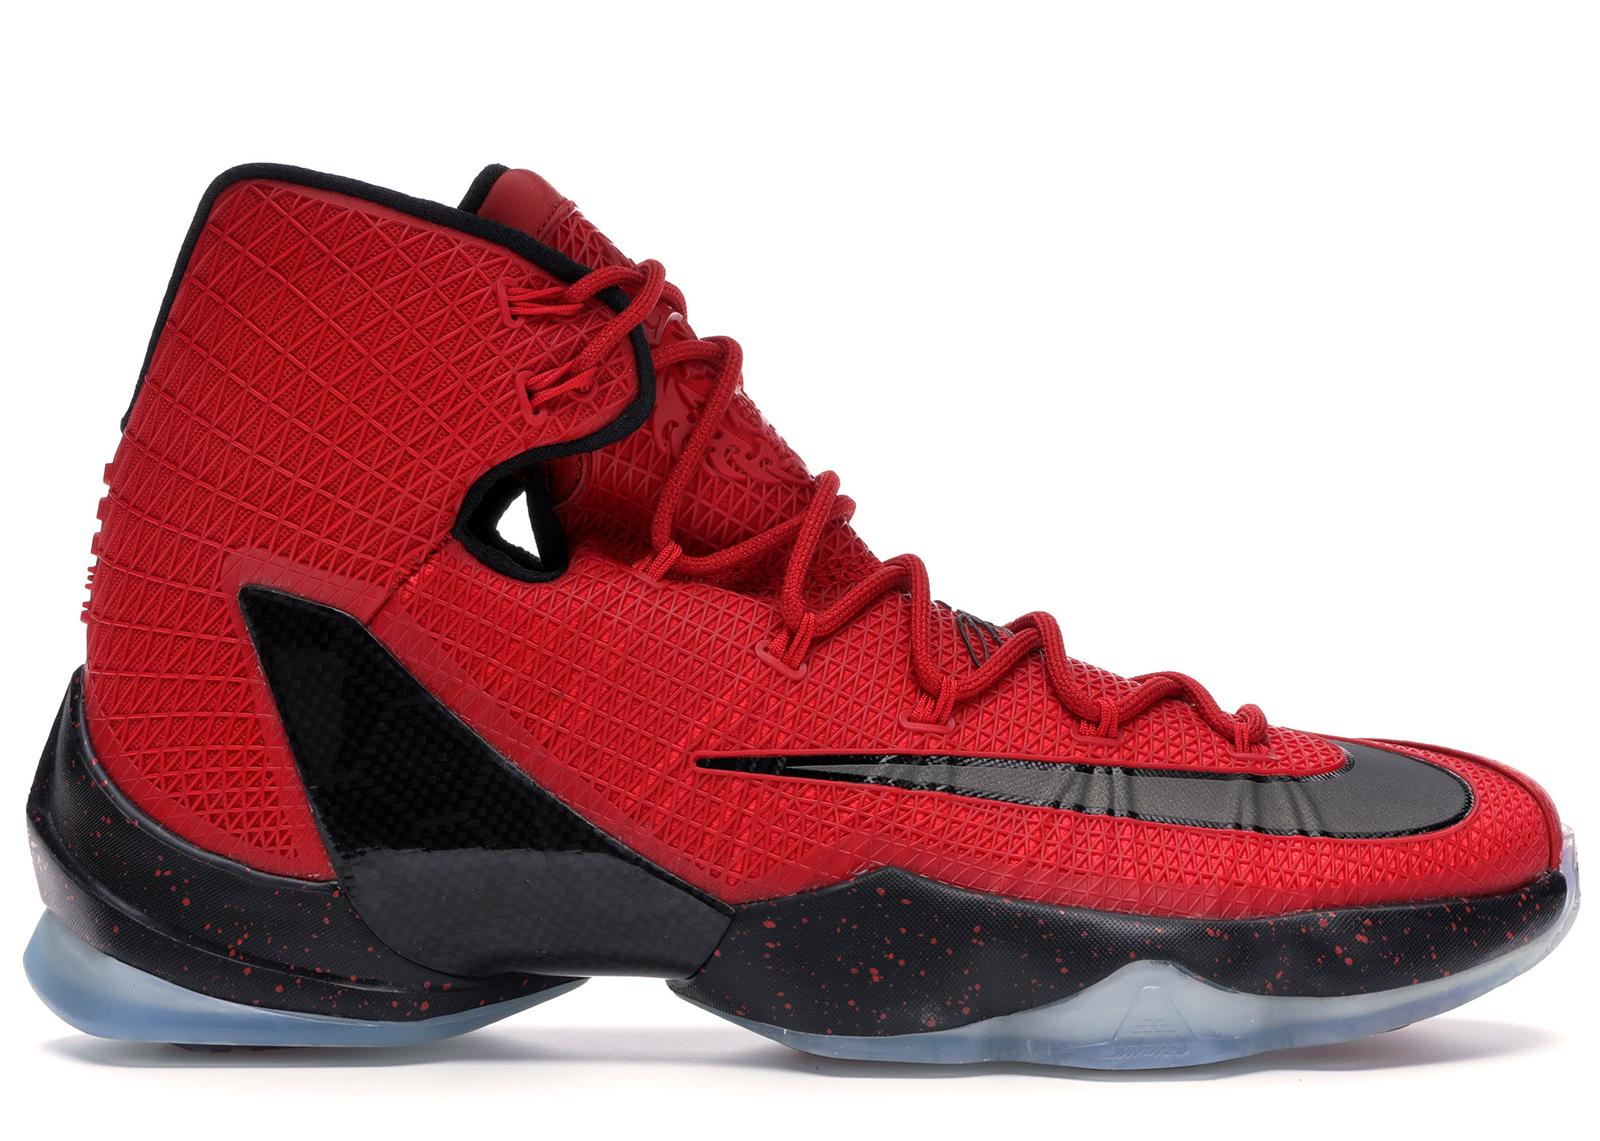 Nike LeBron 13 Elite University Red